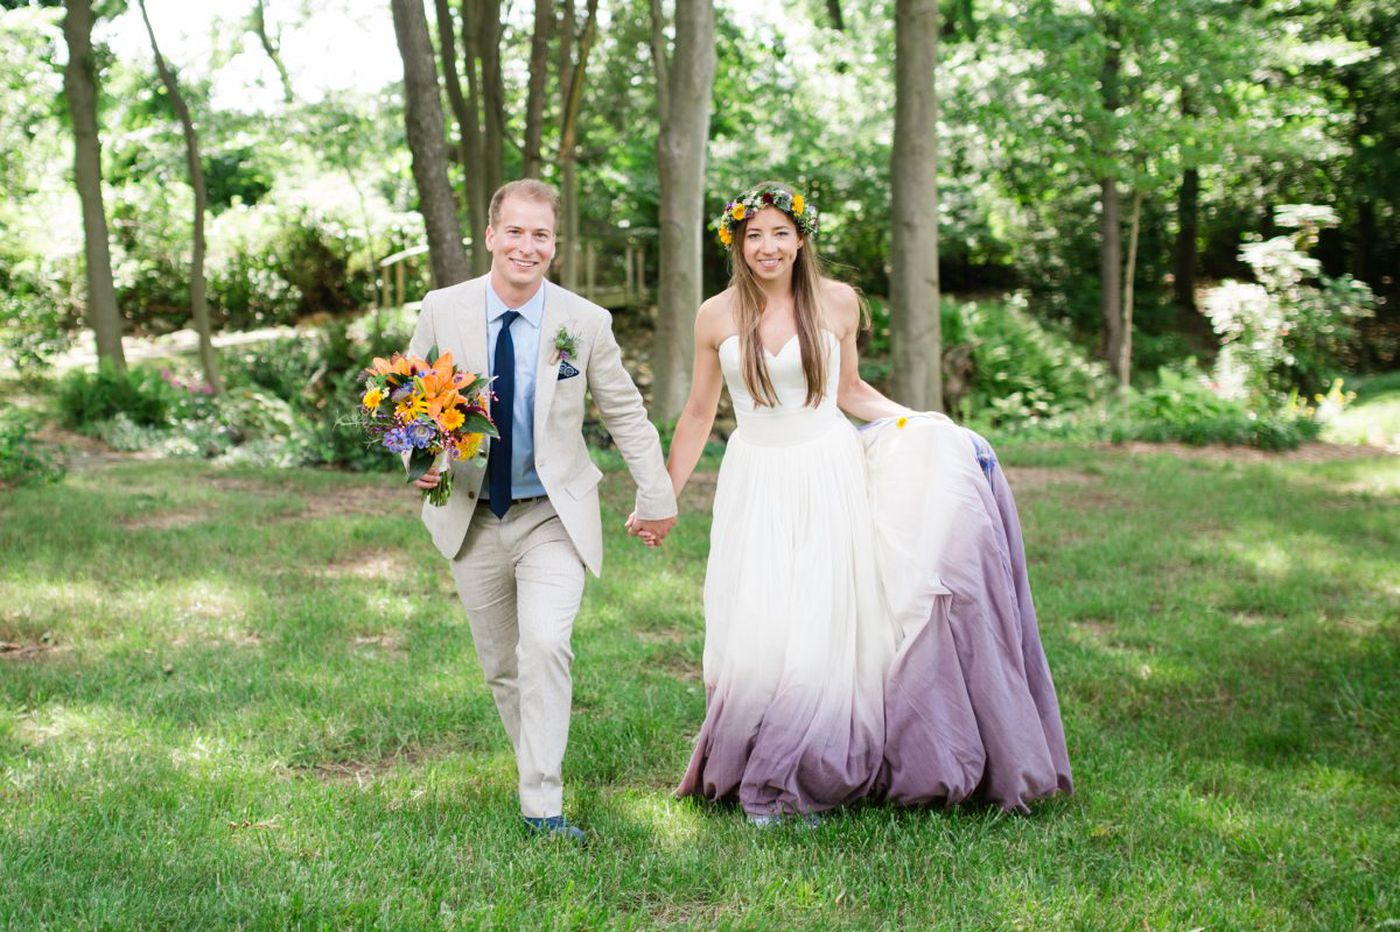 Weddings: Christina Matthias and Hank Garrett